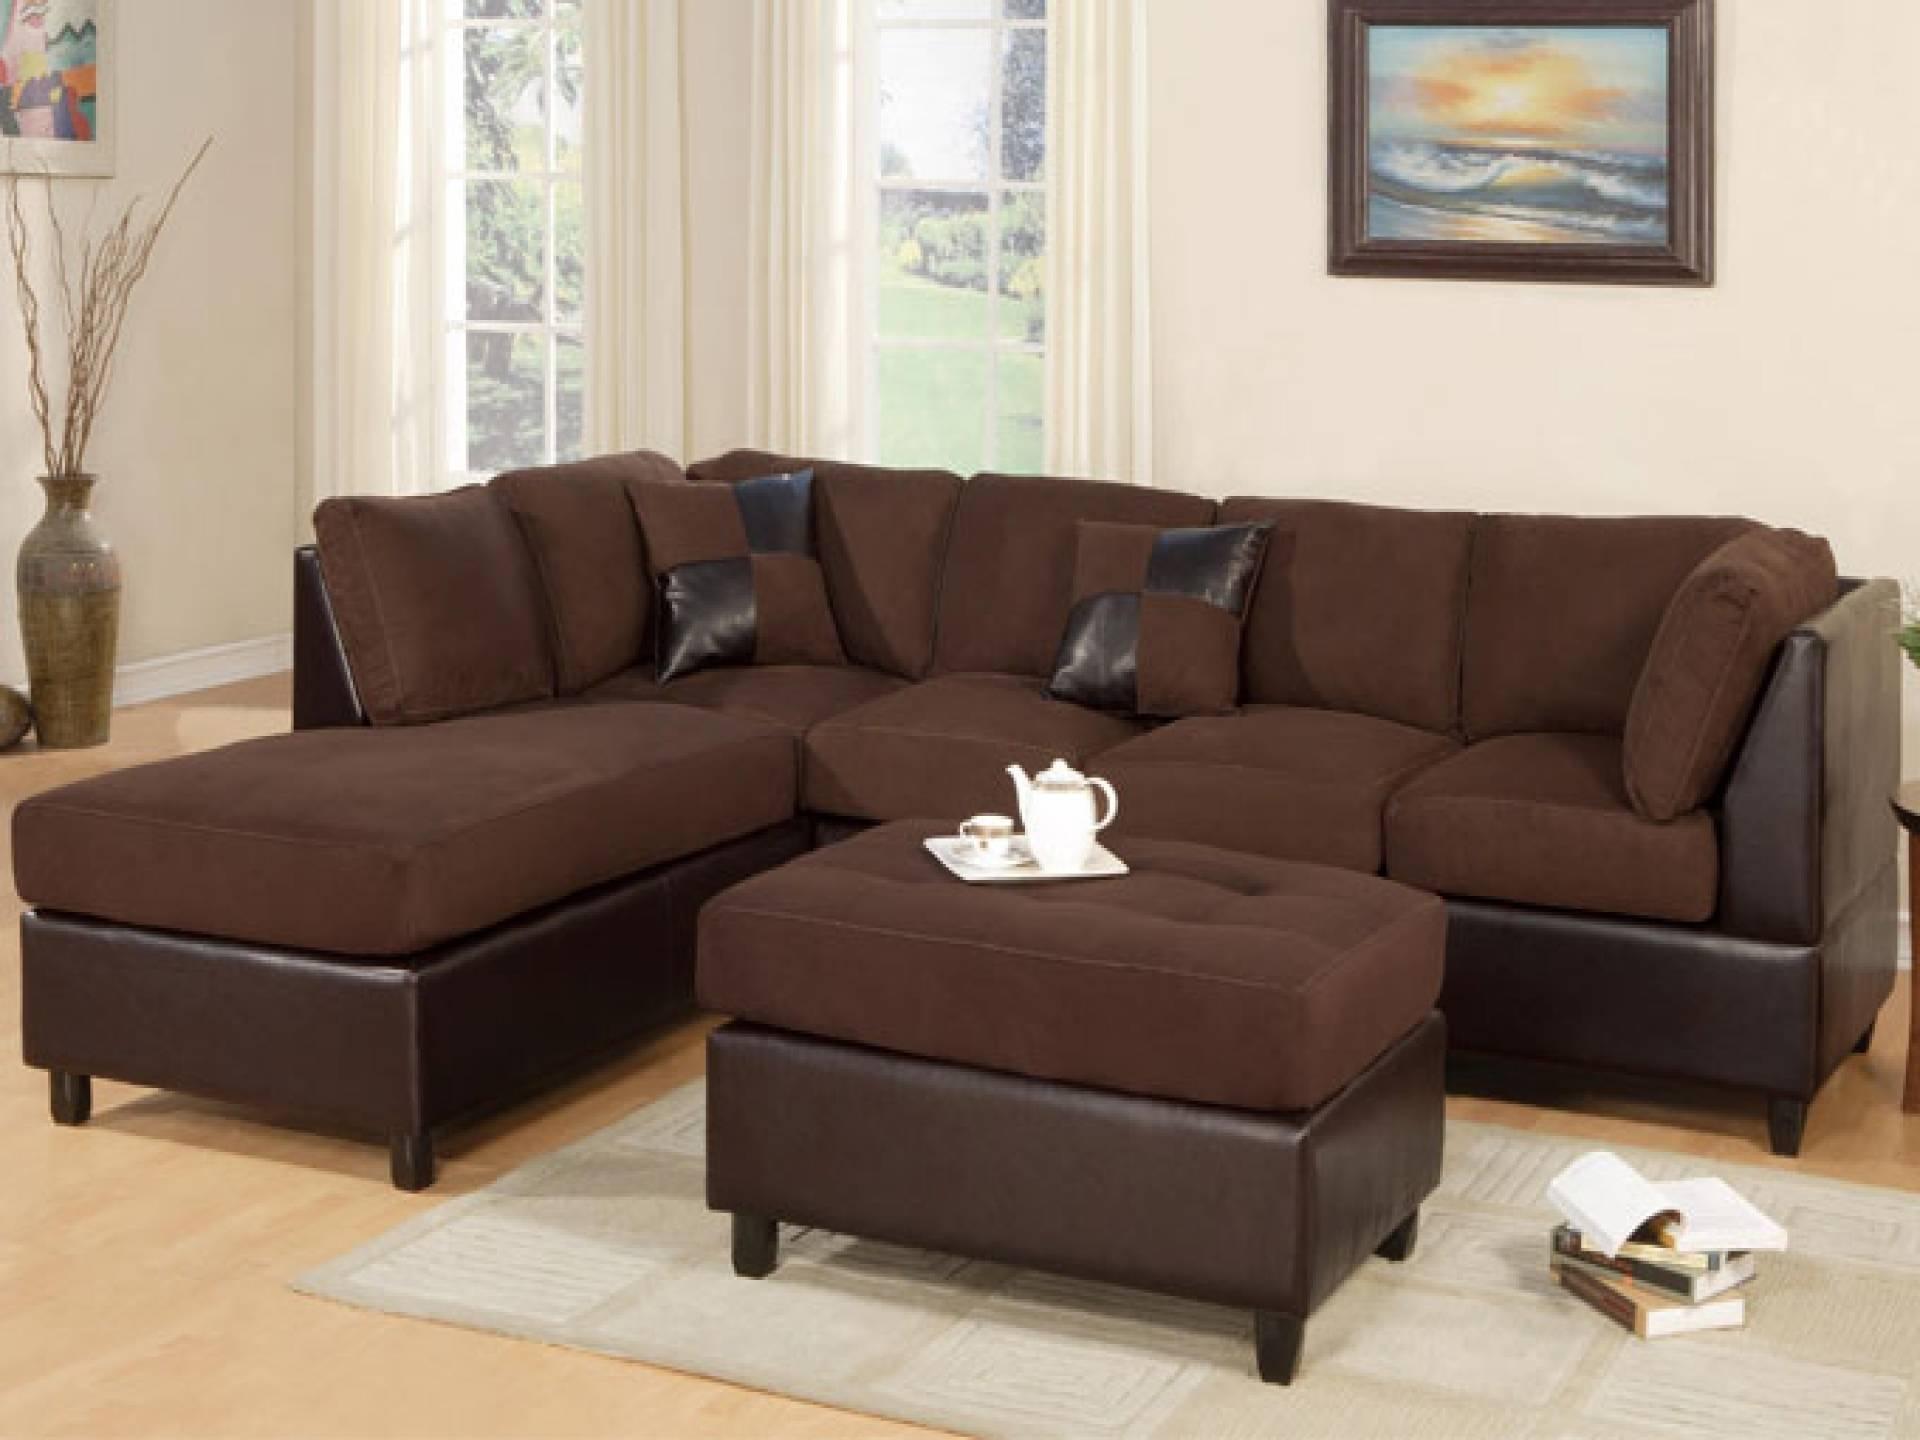 Brown Microfiber Sectional - Pueblosinfronteras in Chocolate Brown Microfiber Sectional Sofas (Image 3 of 15)